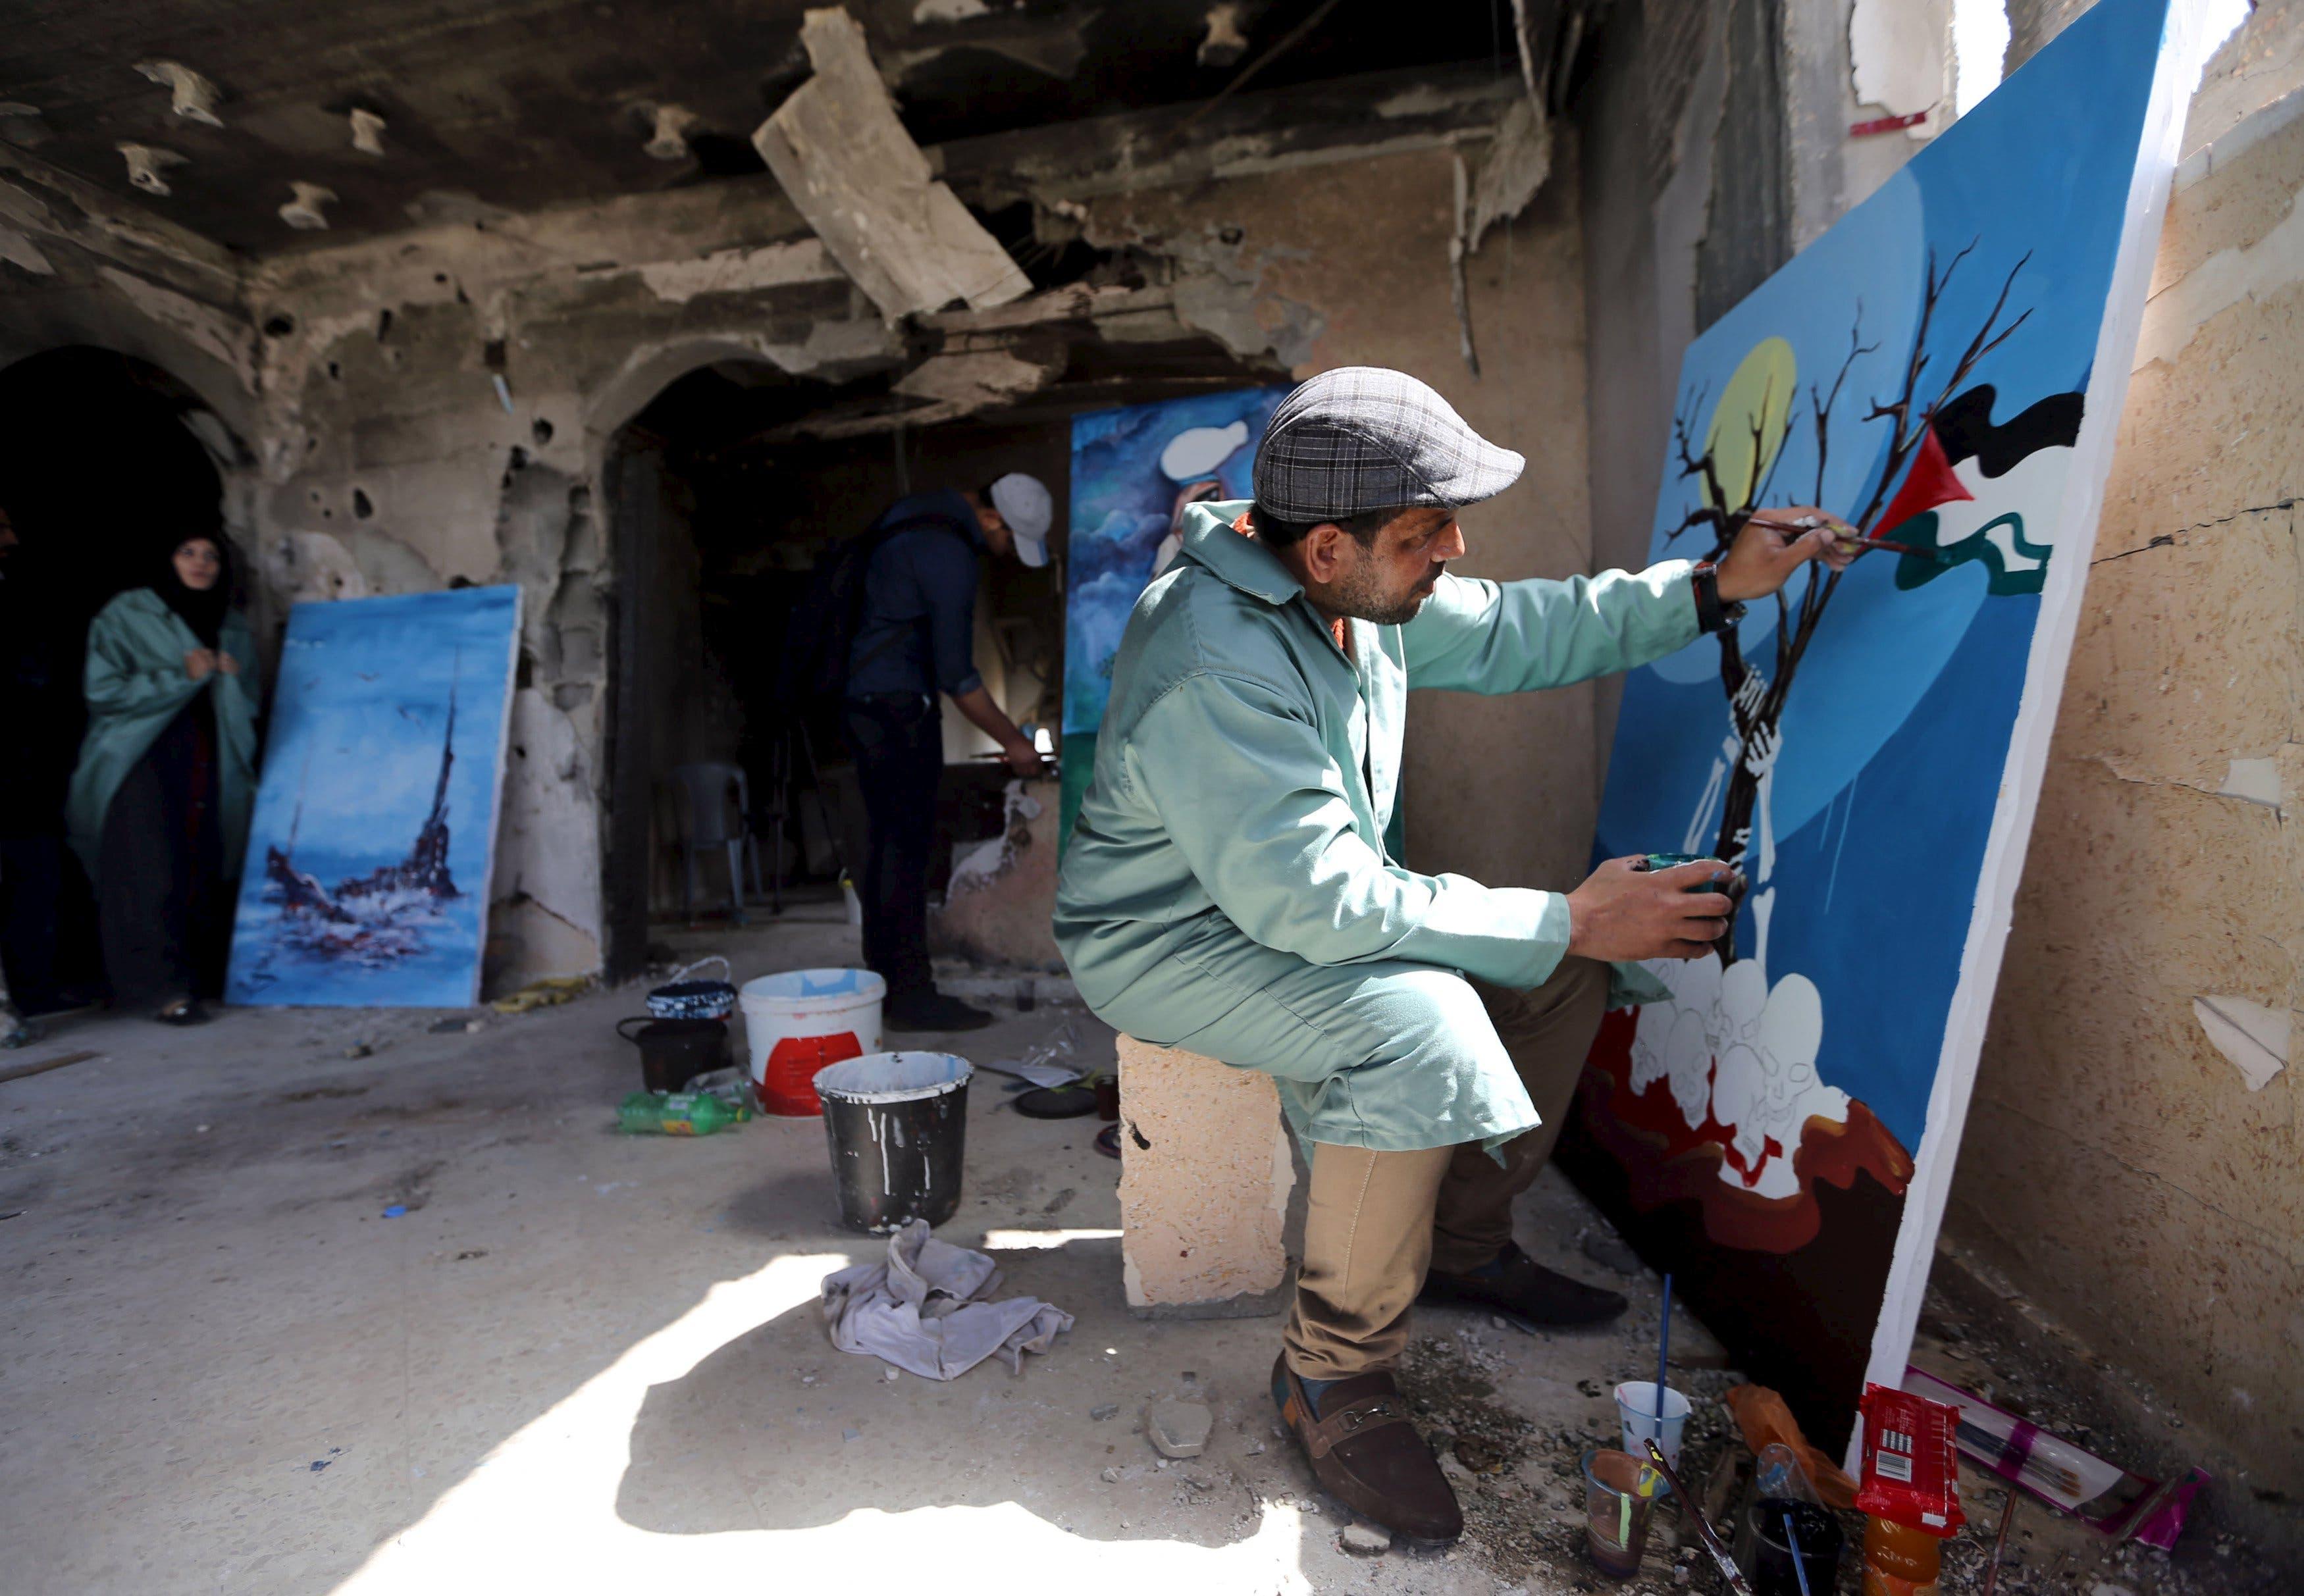 Palestinian artists display talent in Gaza